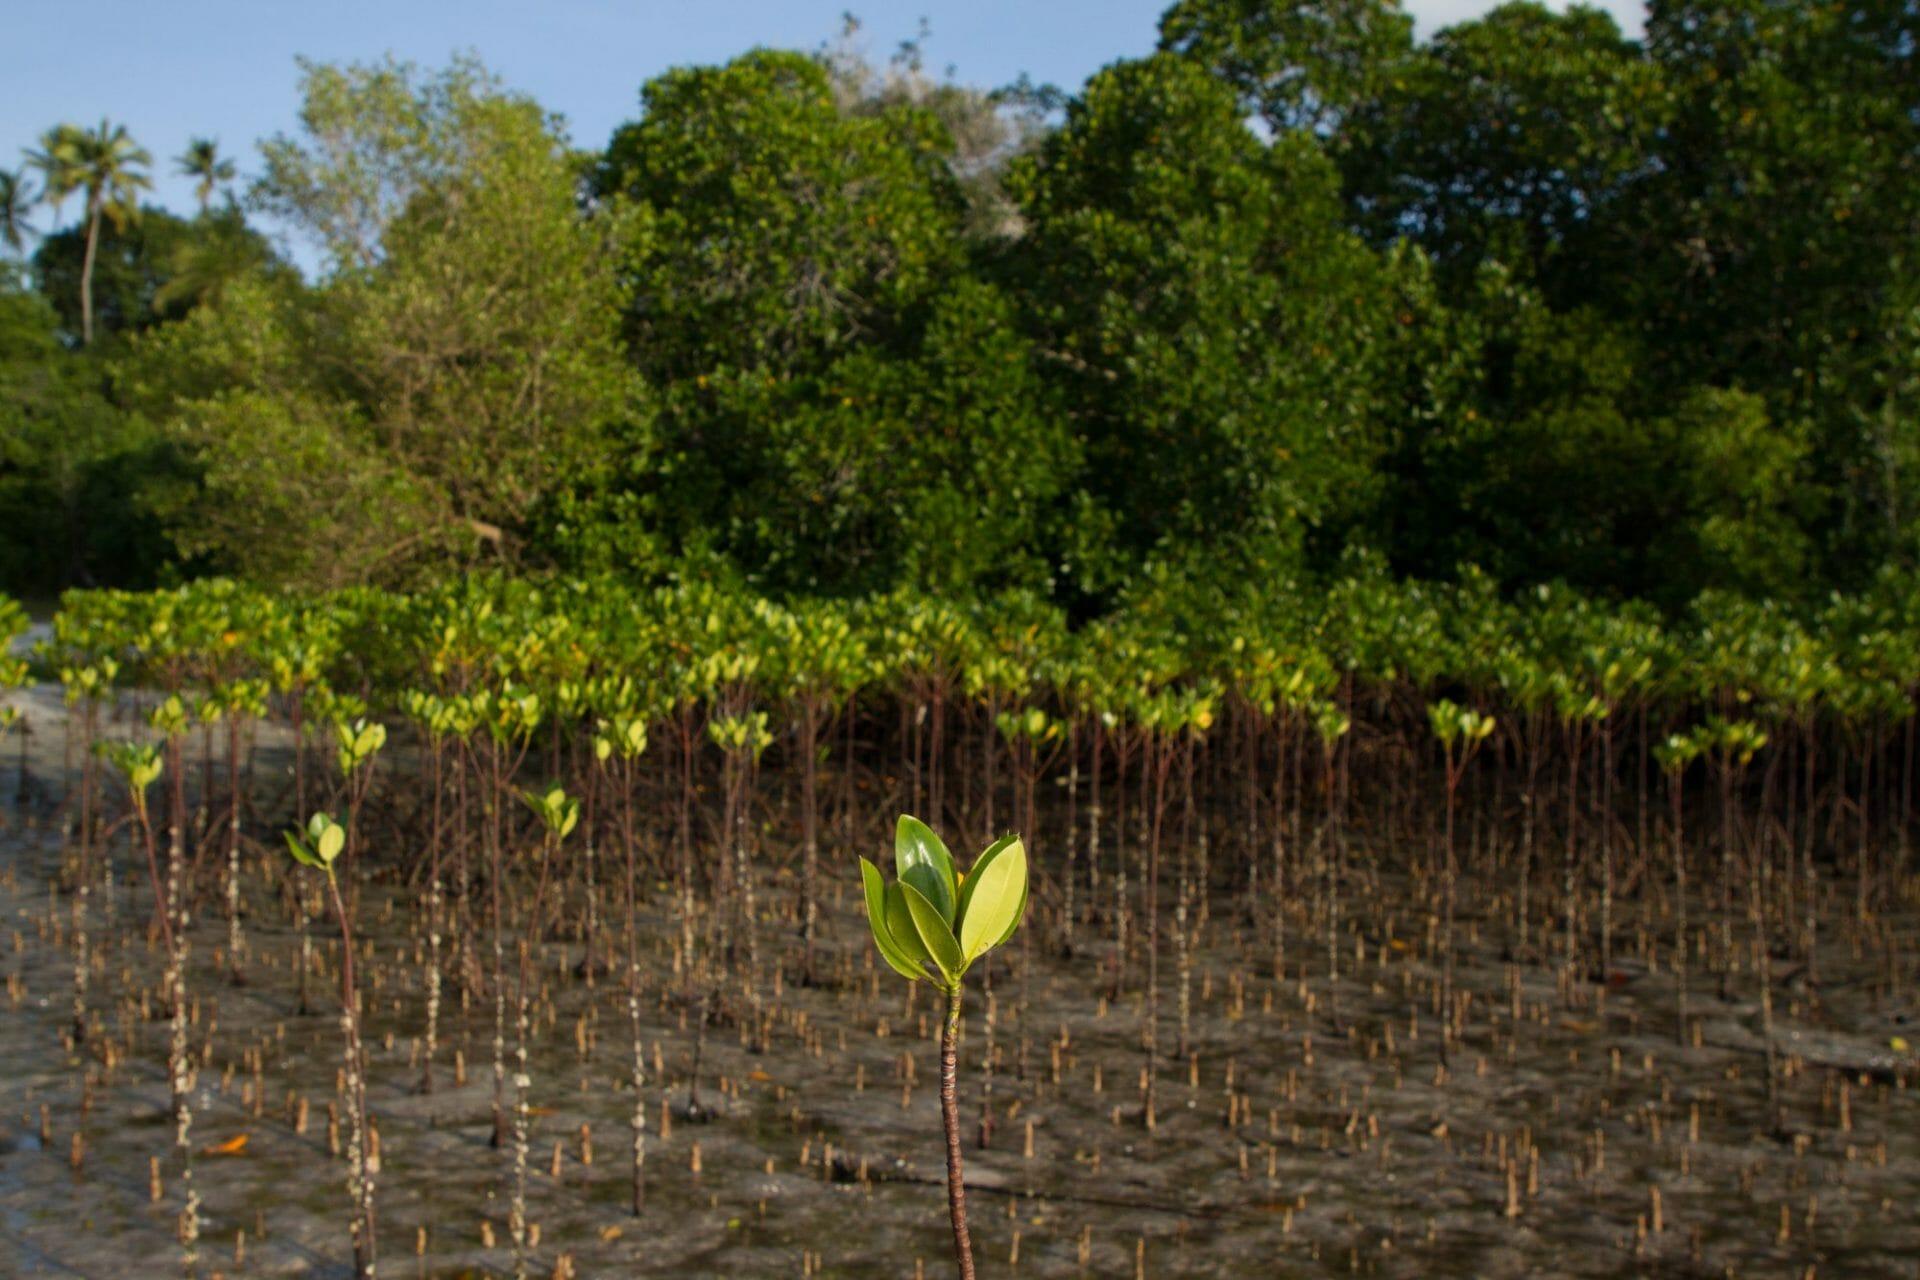 A mangrove seedling up close.